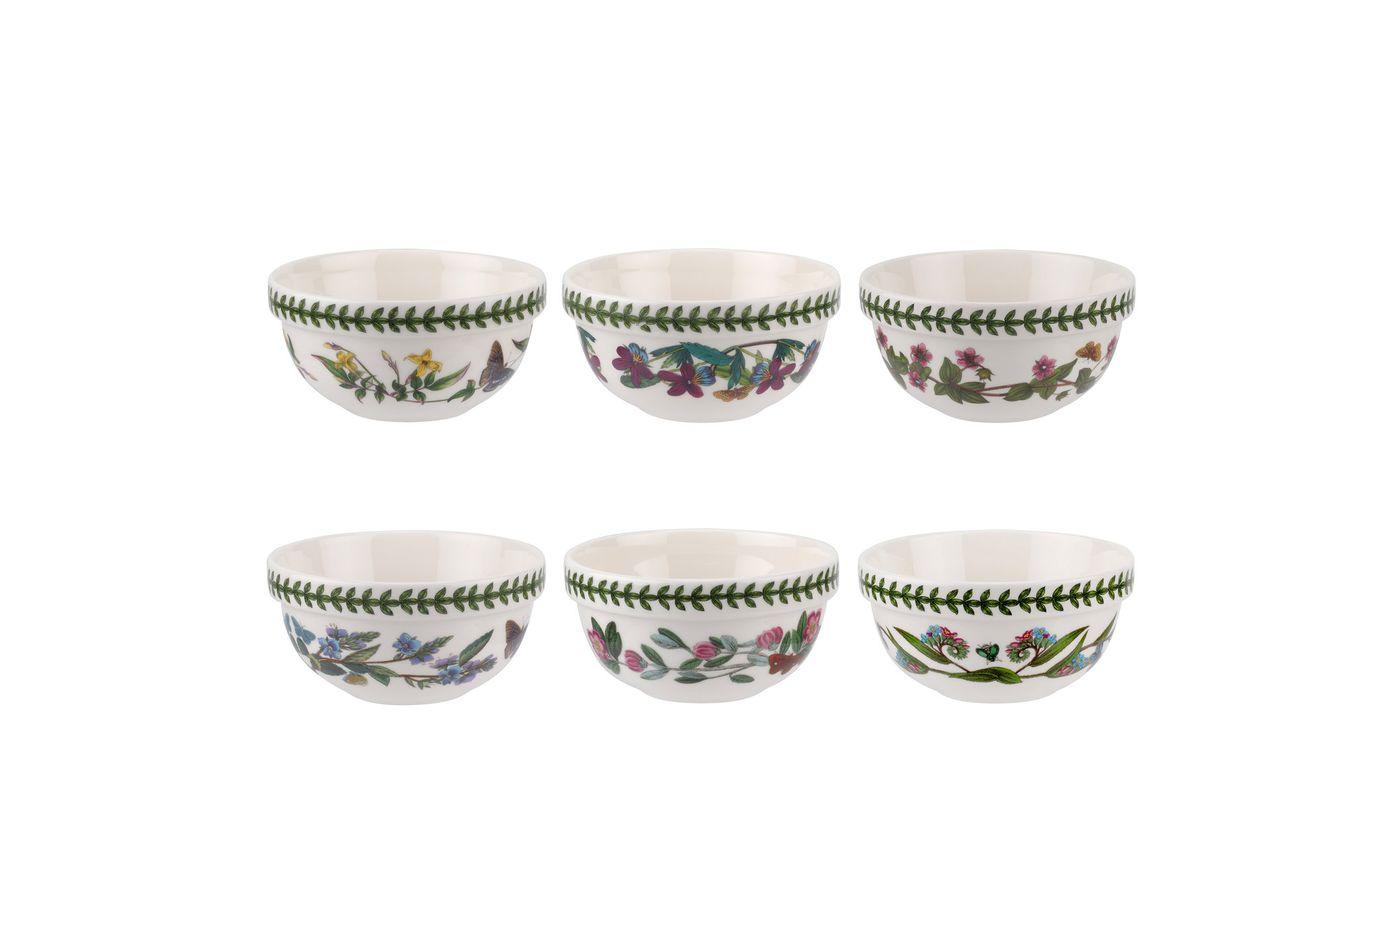 Portmeirion Botanic Garden Stacking Bowl - Set of 6 thumb 2